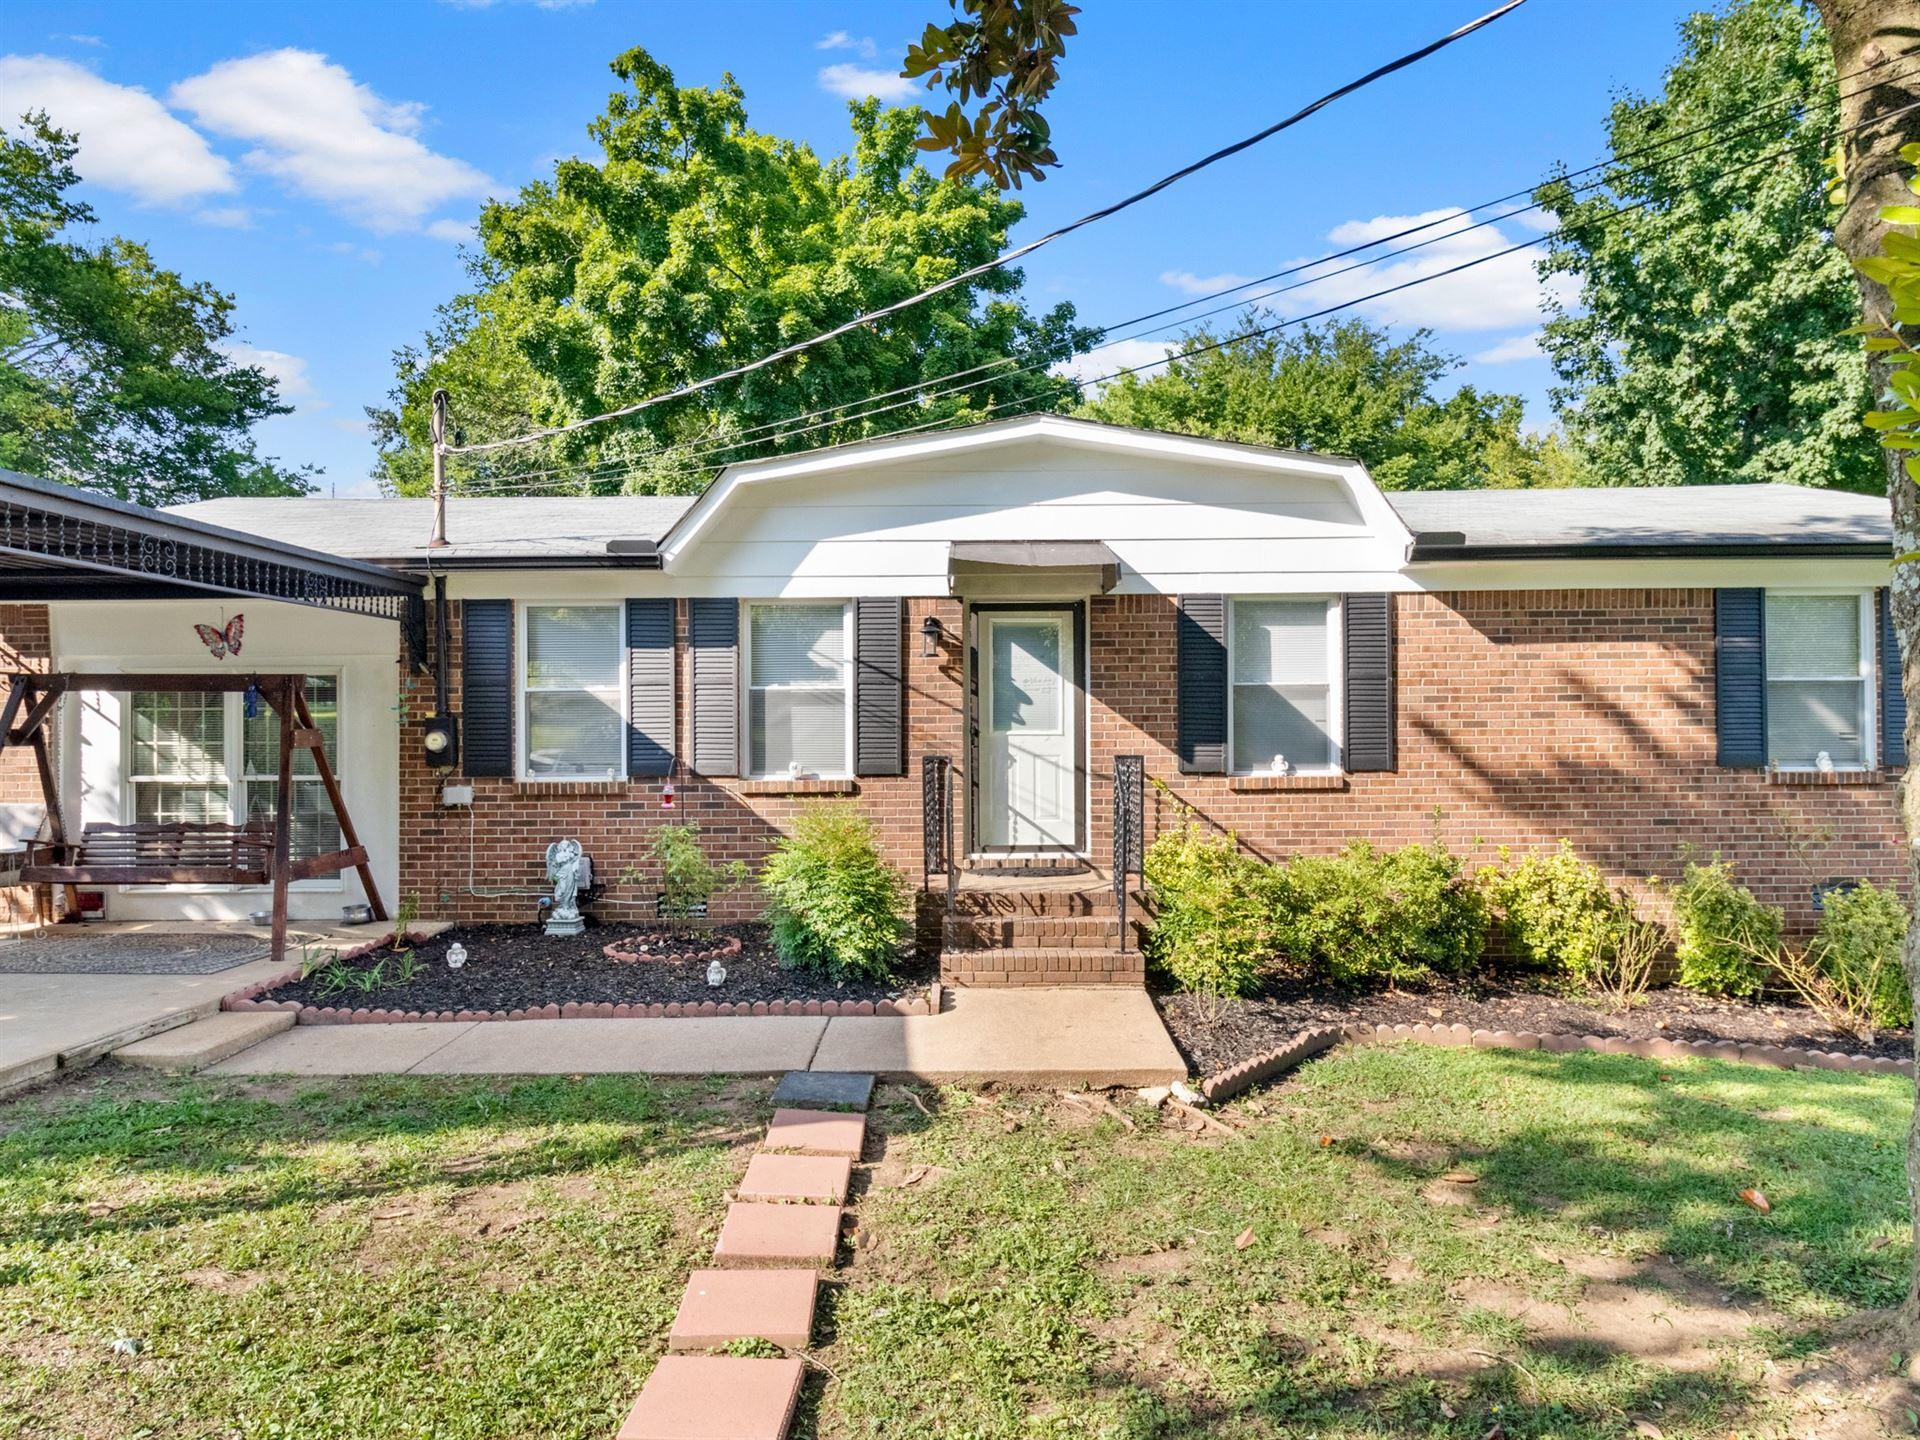 540 Spring St, Lewisburg, TN 37091 - MLS#: 2281312